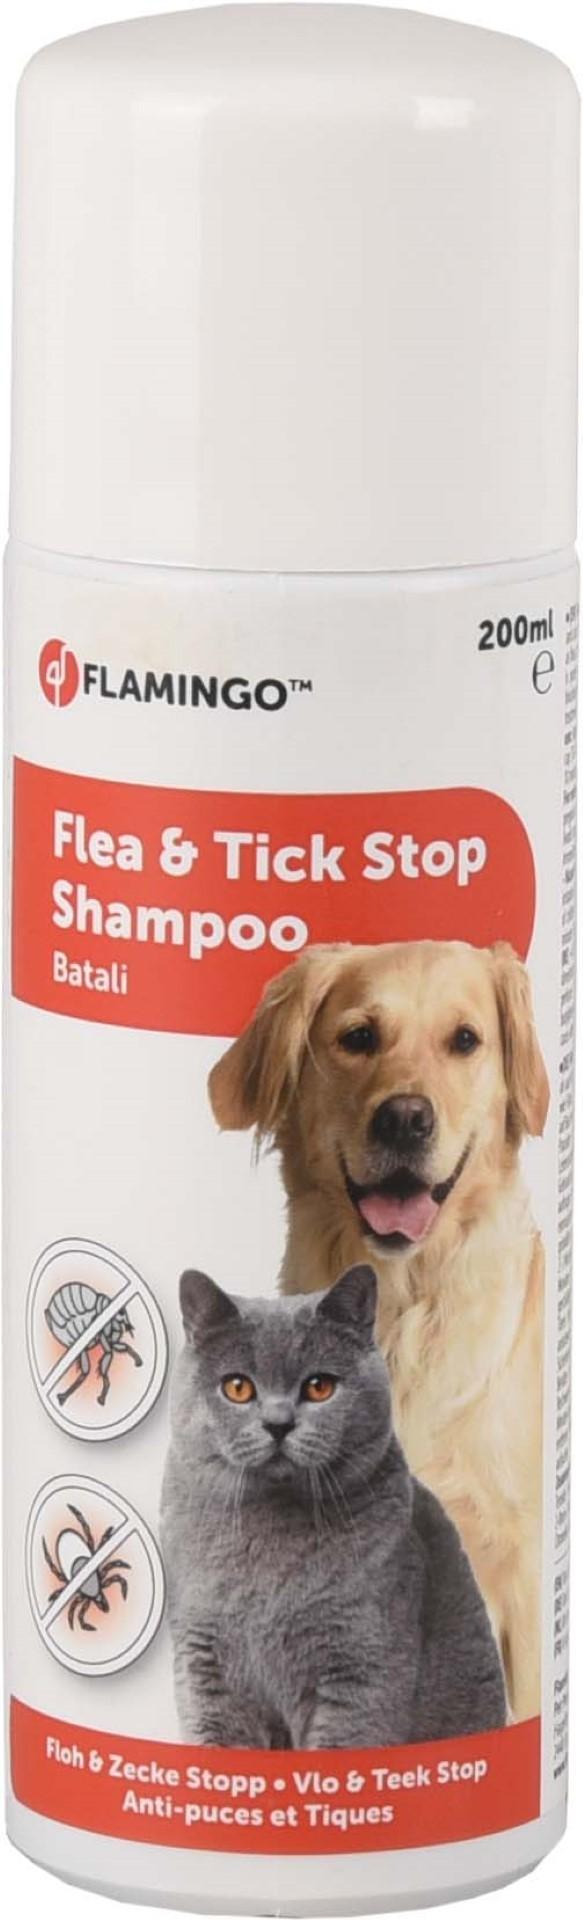 Antiparasiet batali vlo & teek stop shampoo 200 ml Flamingo